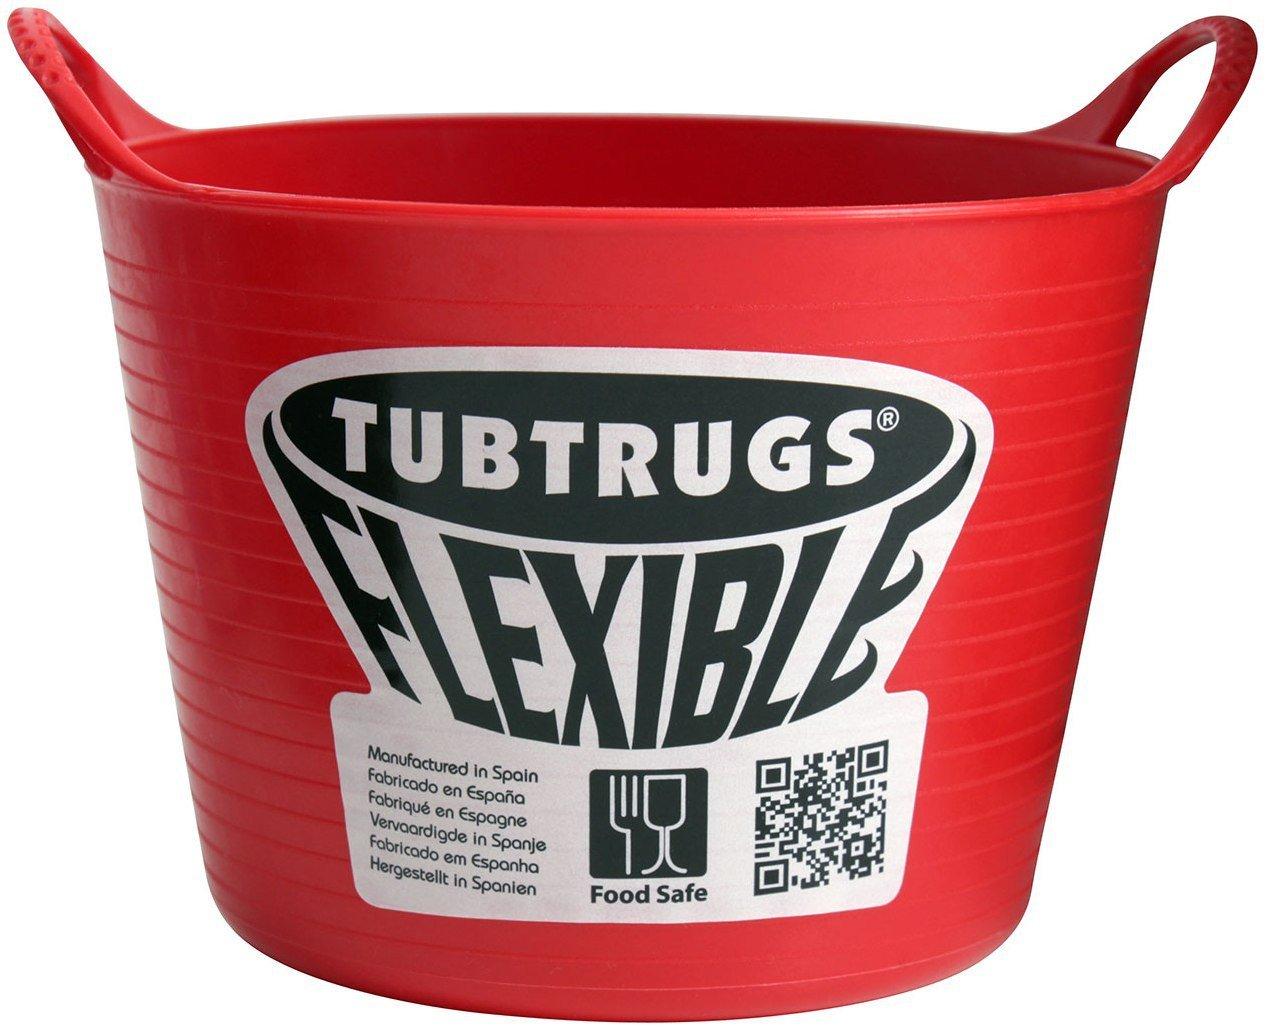 Tubtrugs SPMICR Flexible Red Micro .37 Liter/12.5 Ounce Capacity